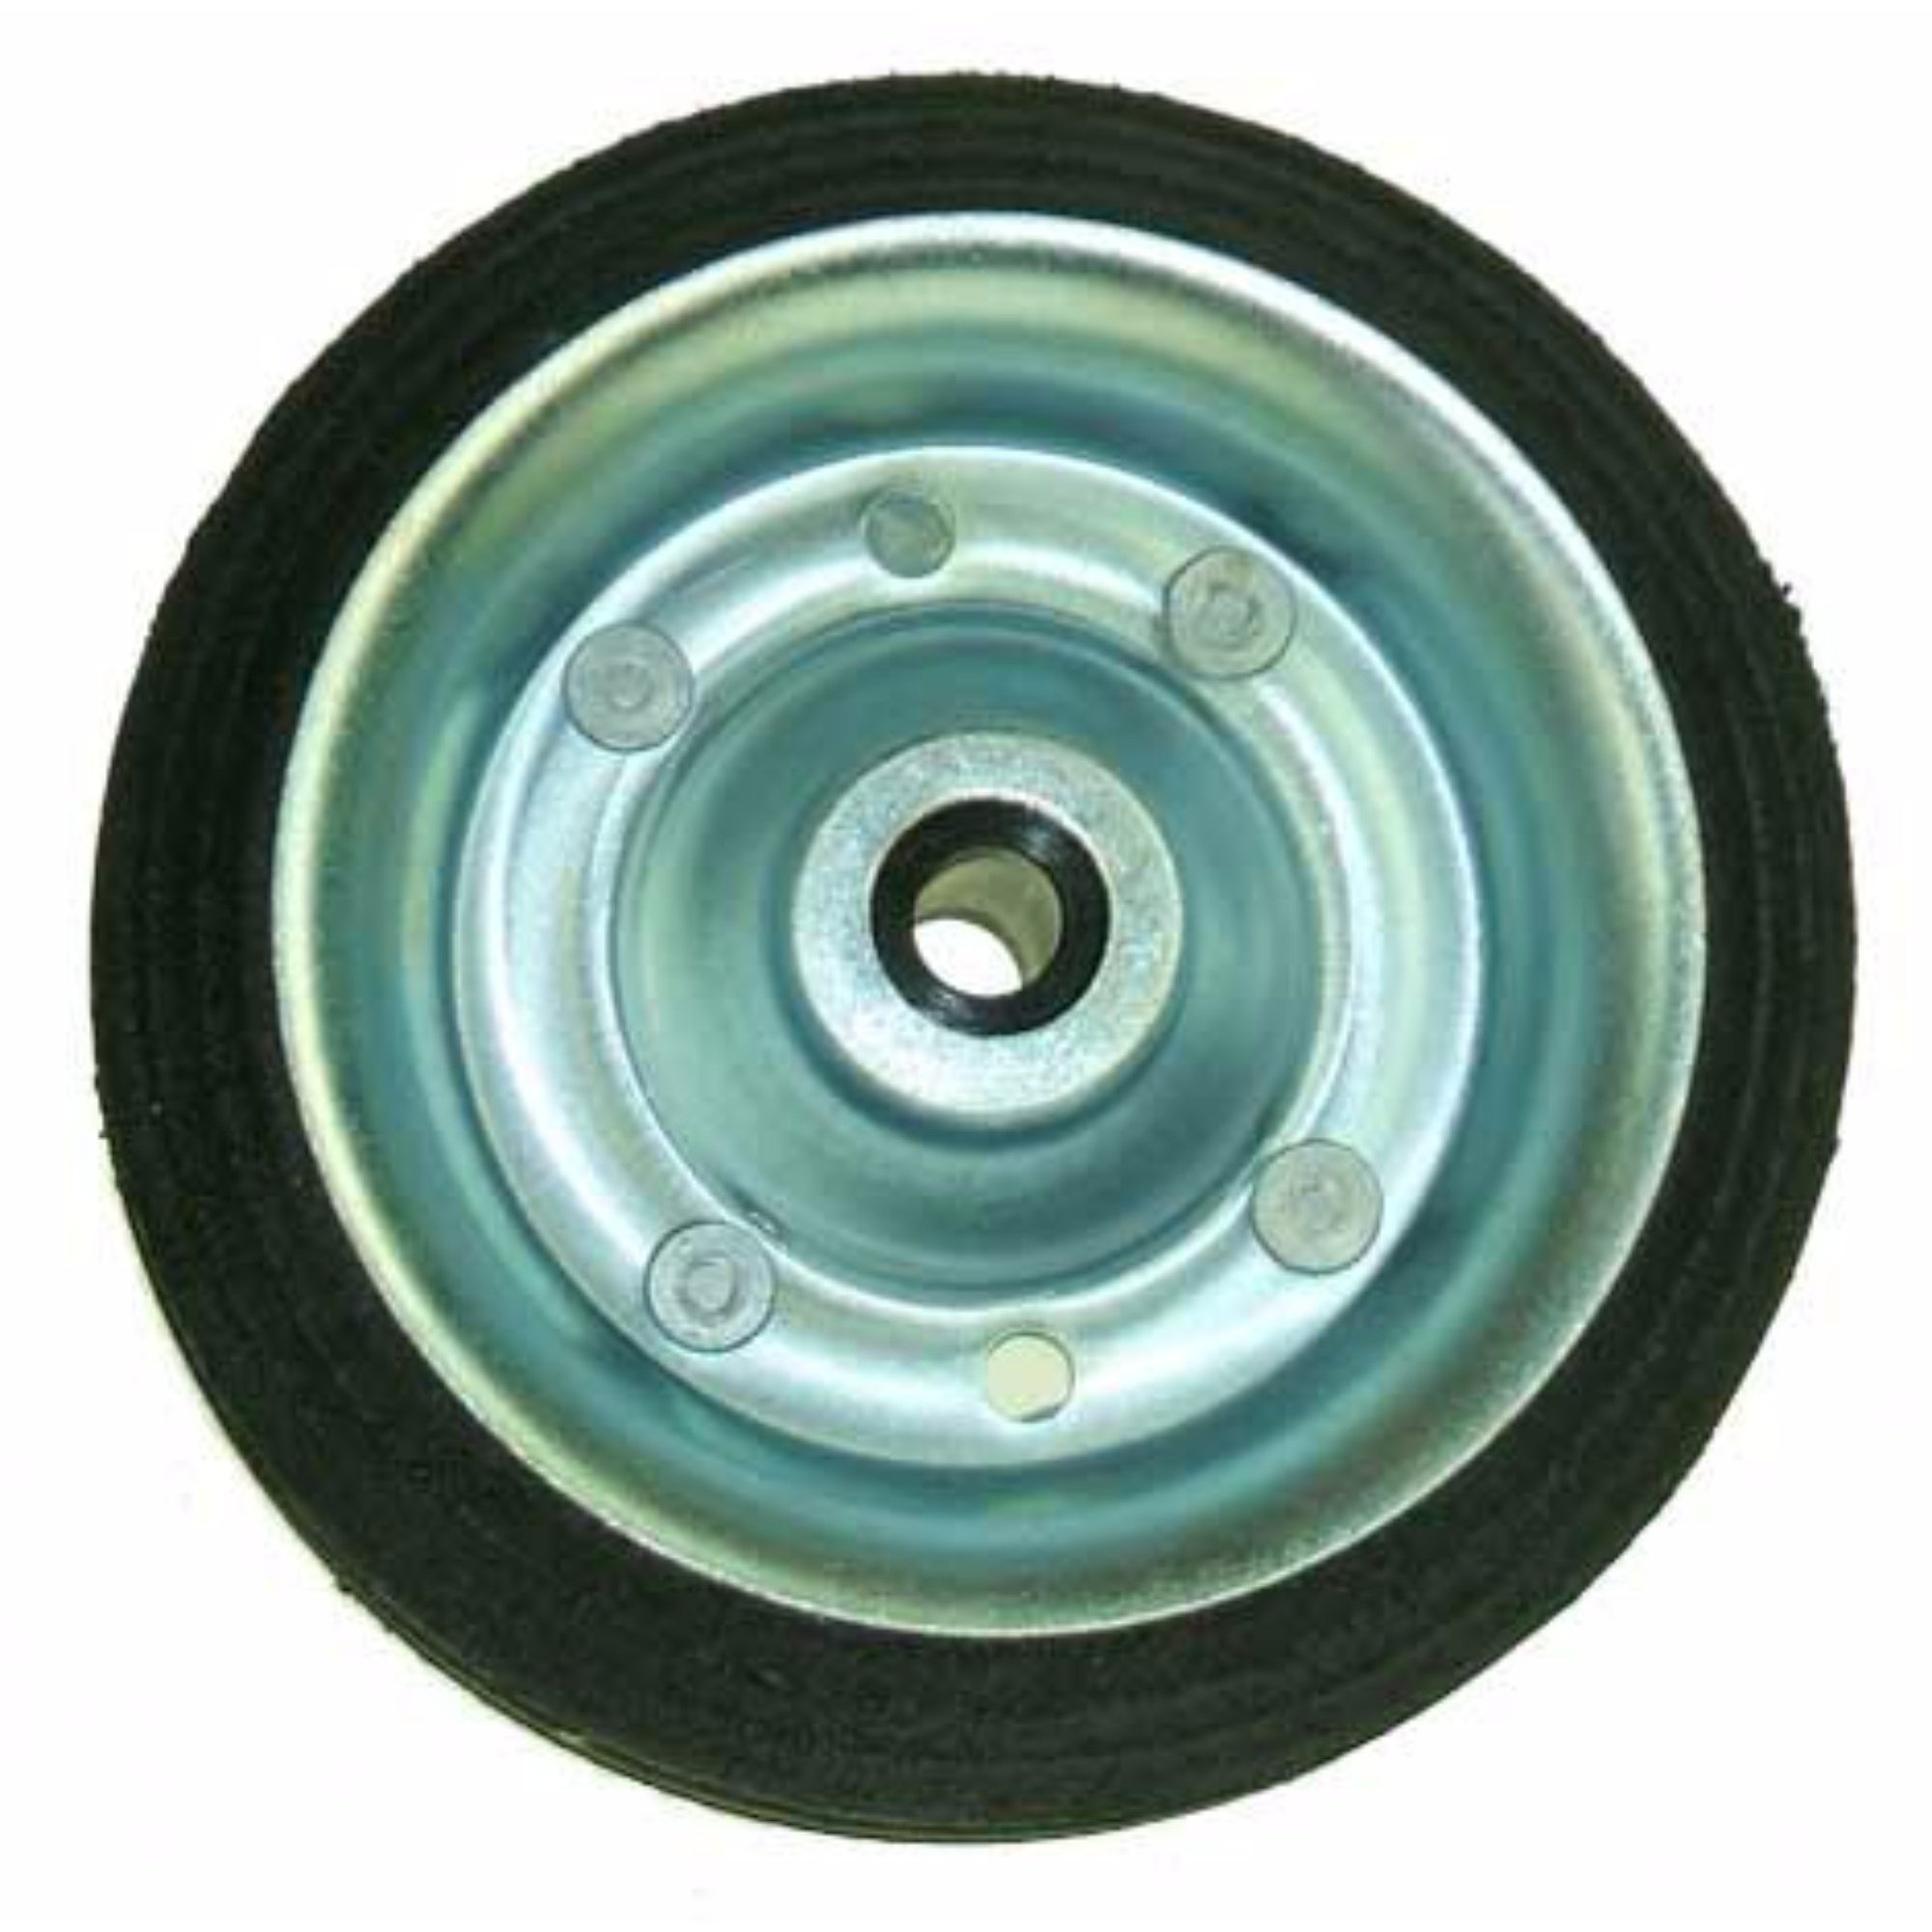 Spare Jockey Wheel (One Size) (Silver/Black)